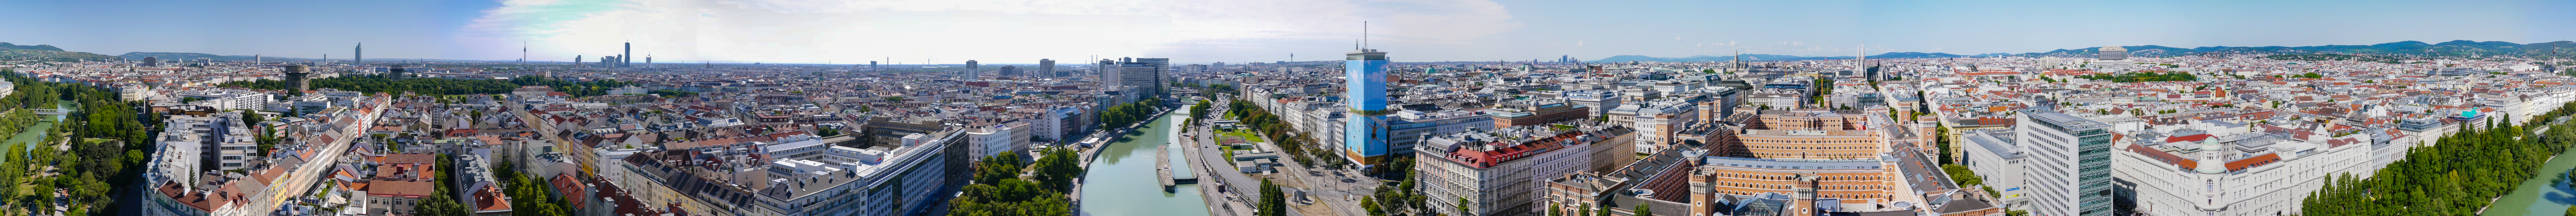 Donaukanal Wien Ringturm